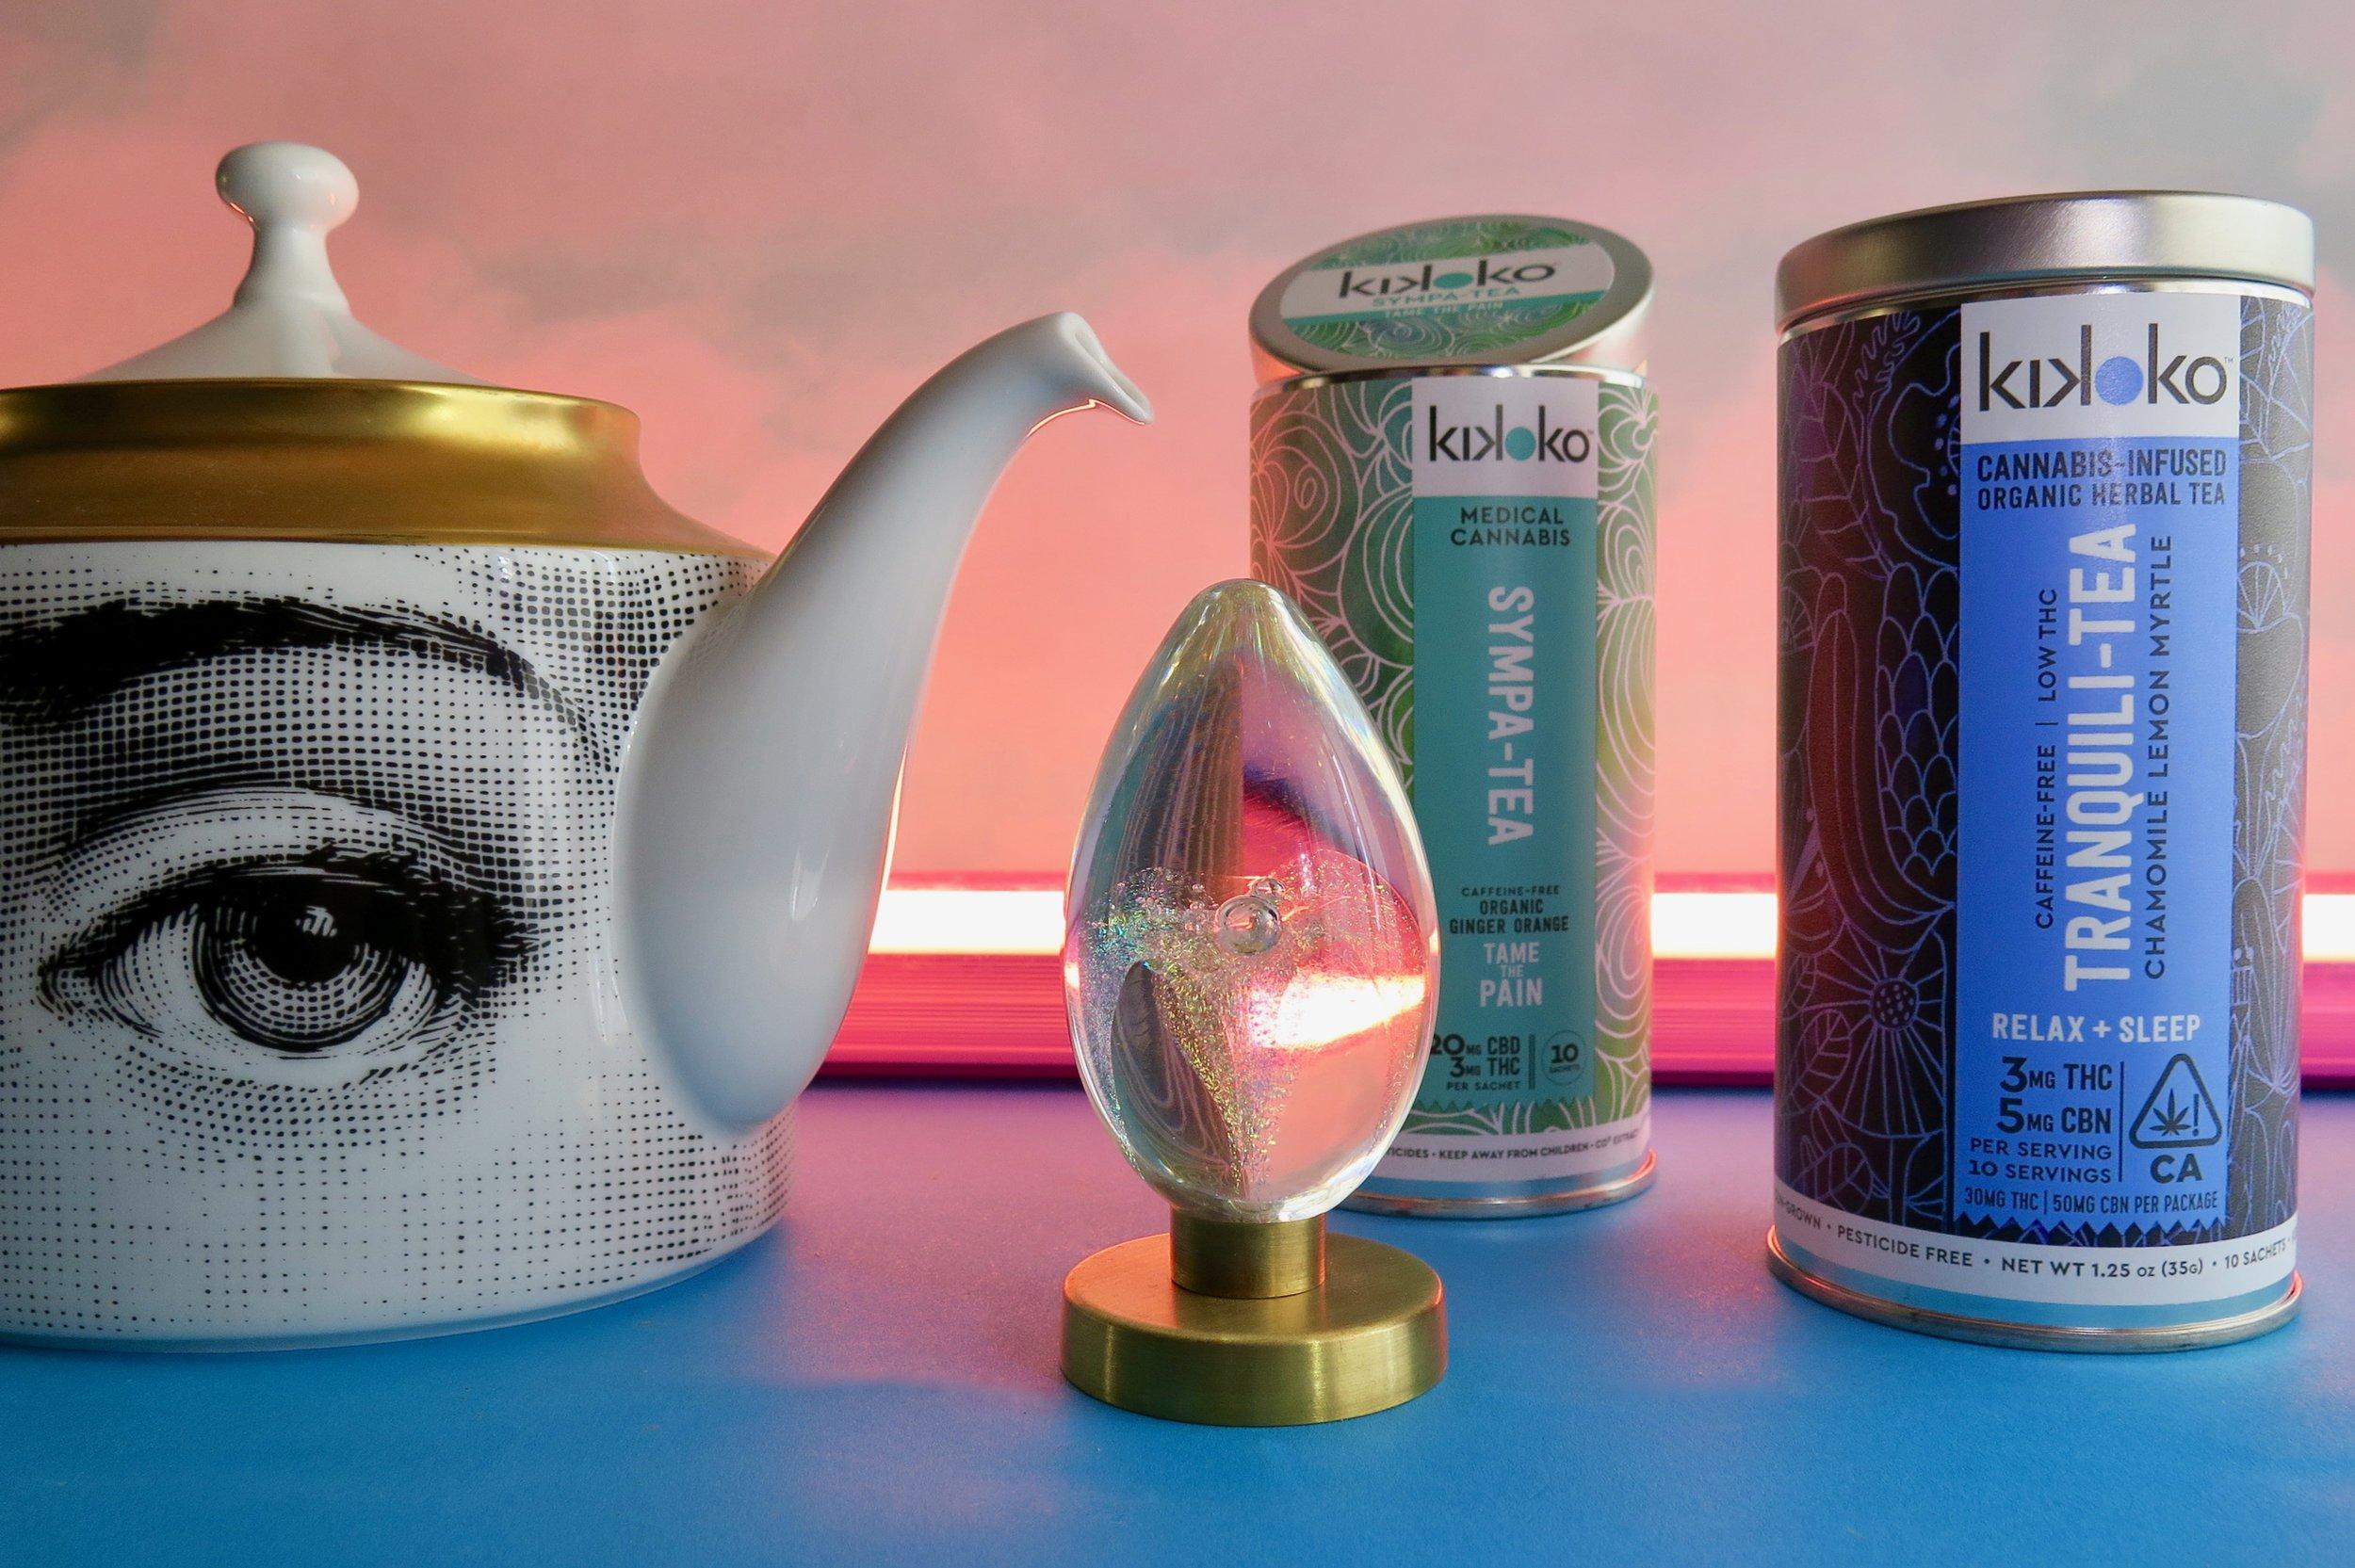 Sympa-Tea and Tranquili-Tea by Kikoko. Photo: Marcia Gagliardi. © mymilligram. Styling: Christian Jusinski/ Surfacehaus .